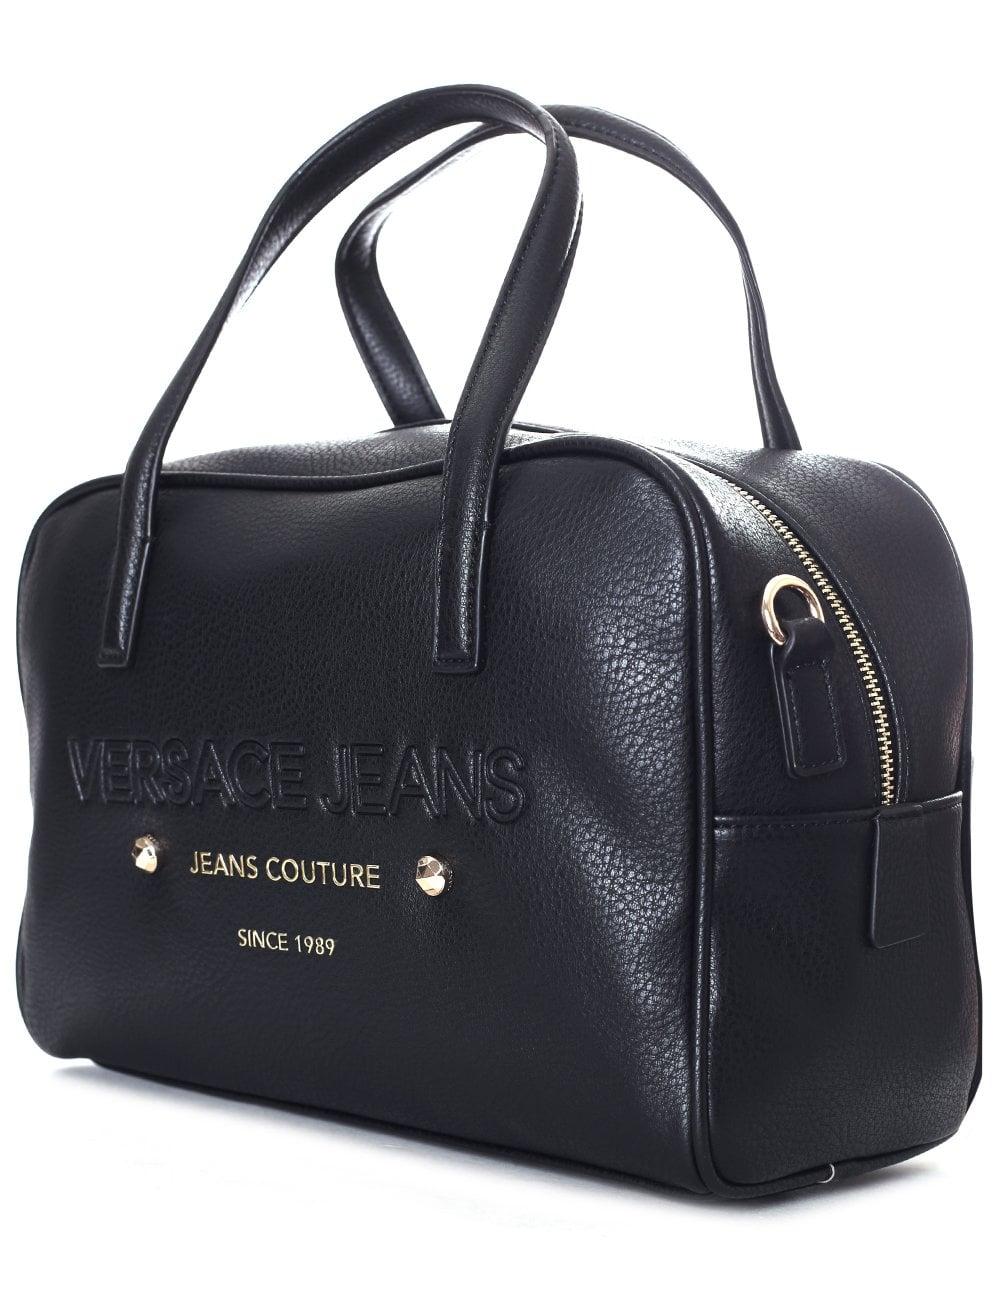 01d37a96df Versace Jeans Women s Couture Bowling Bag